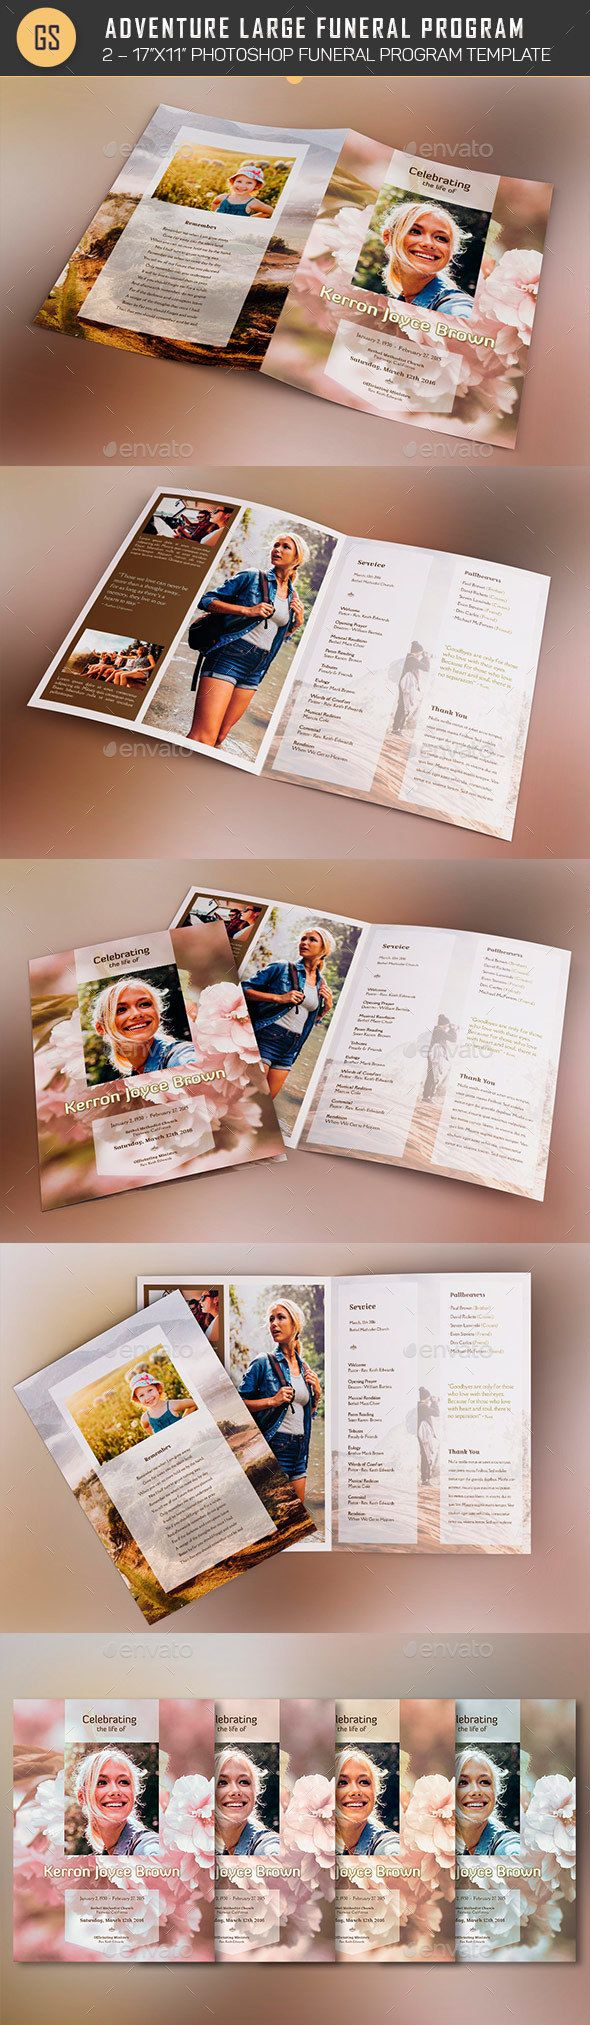 Adventure Large Funeral Program Template Program Template - Informational brochure template